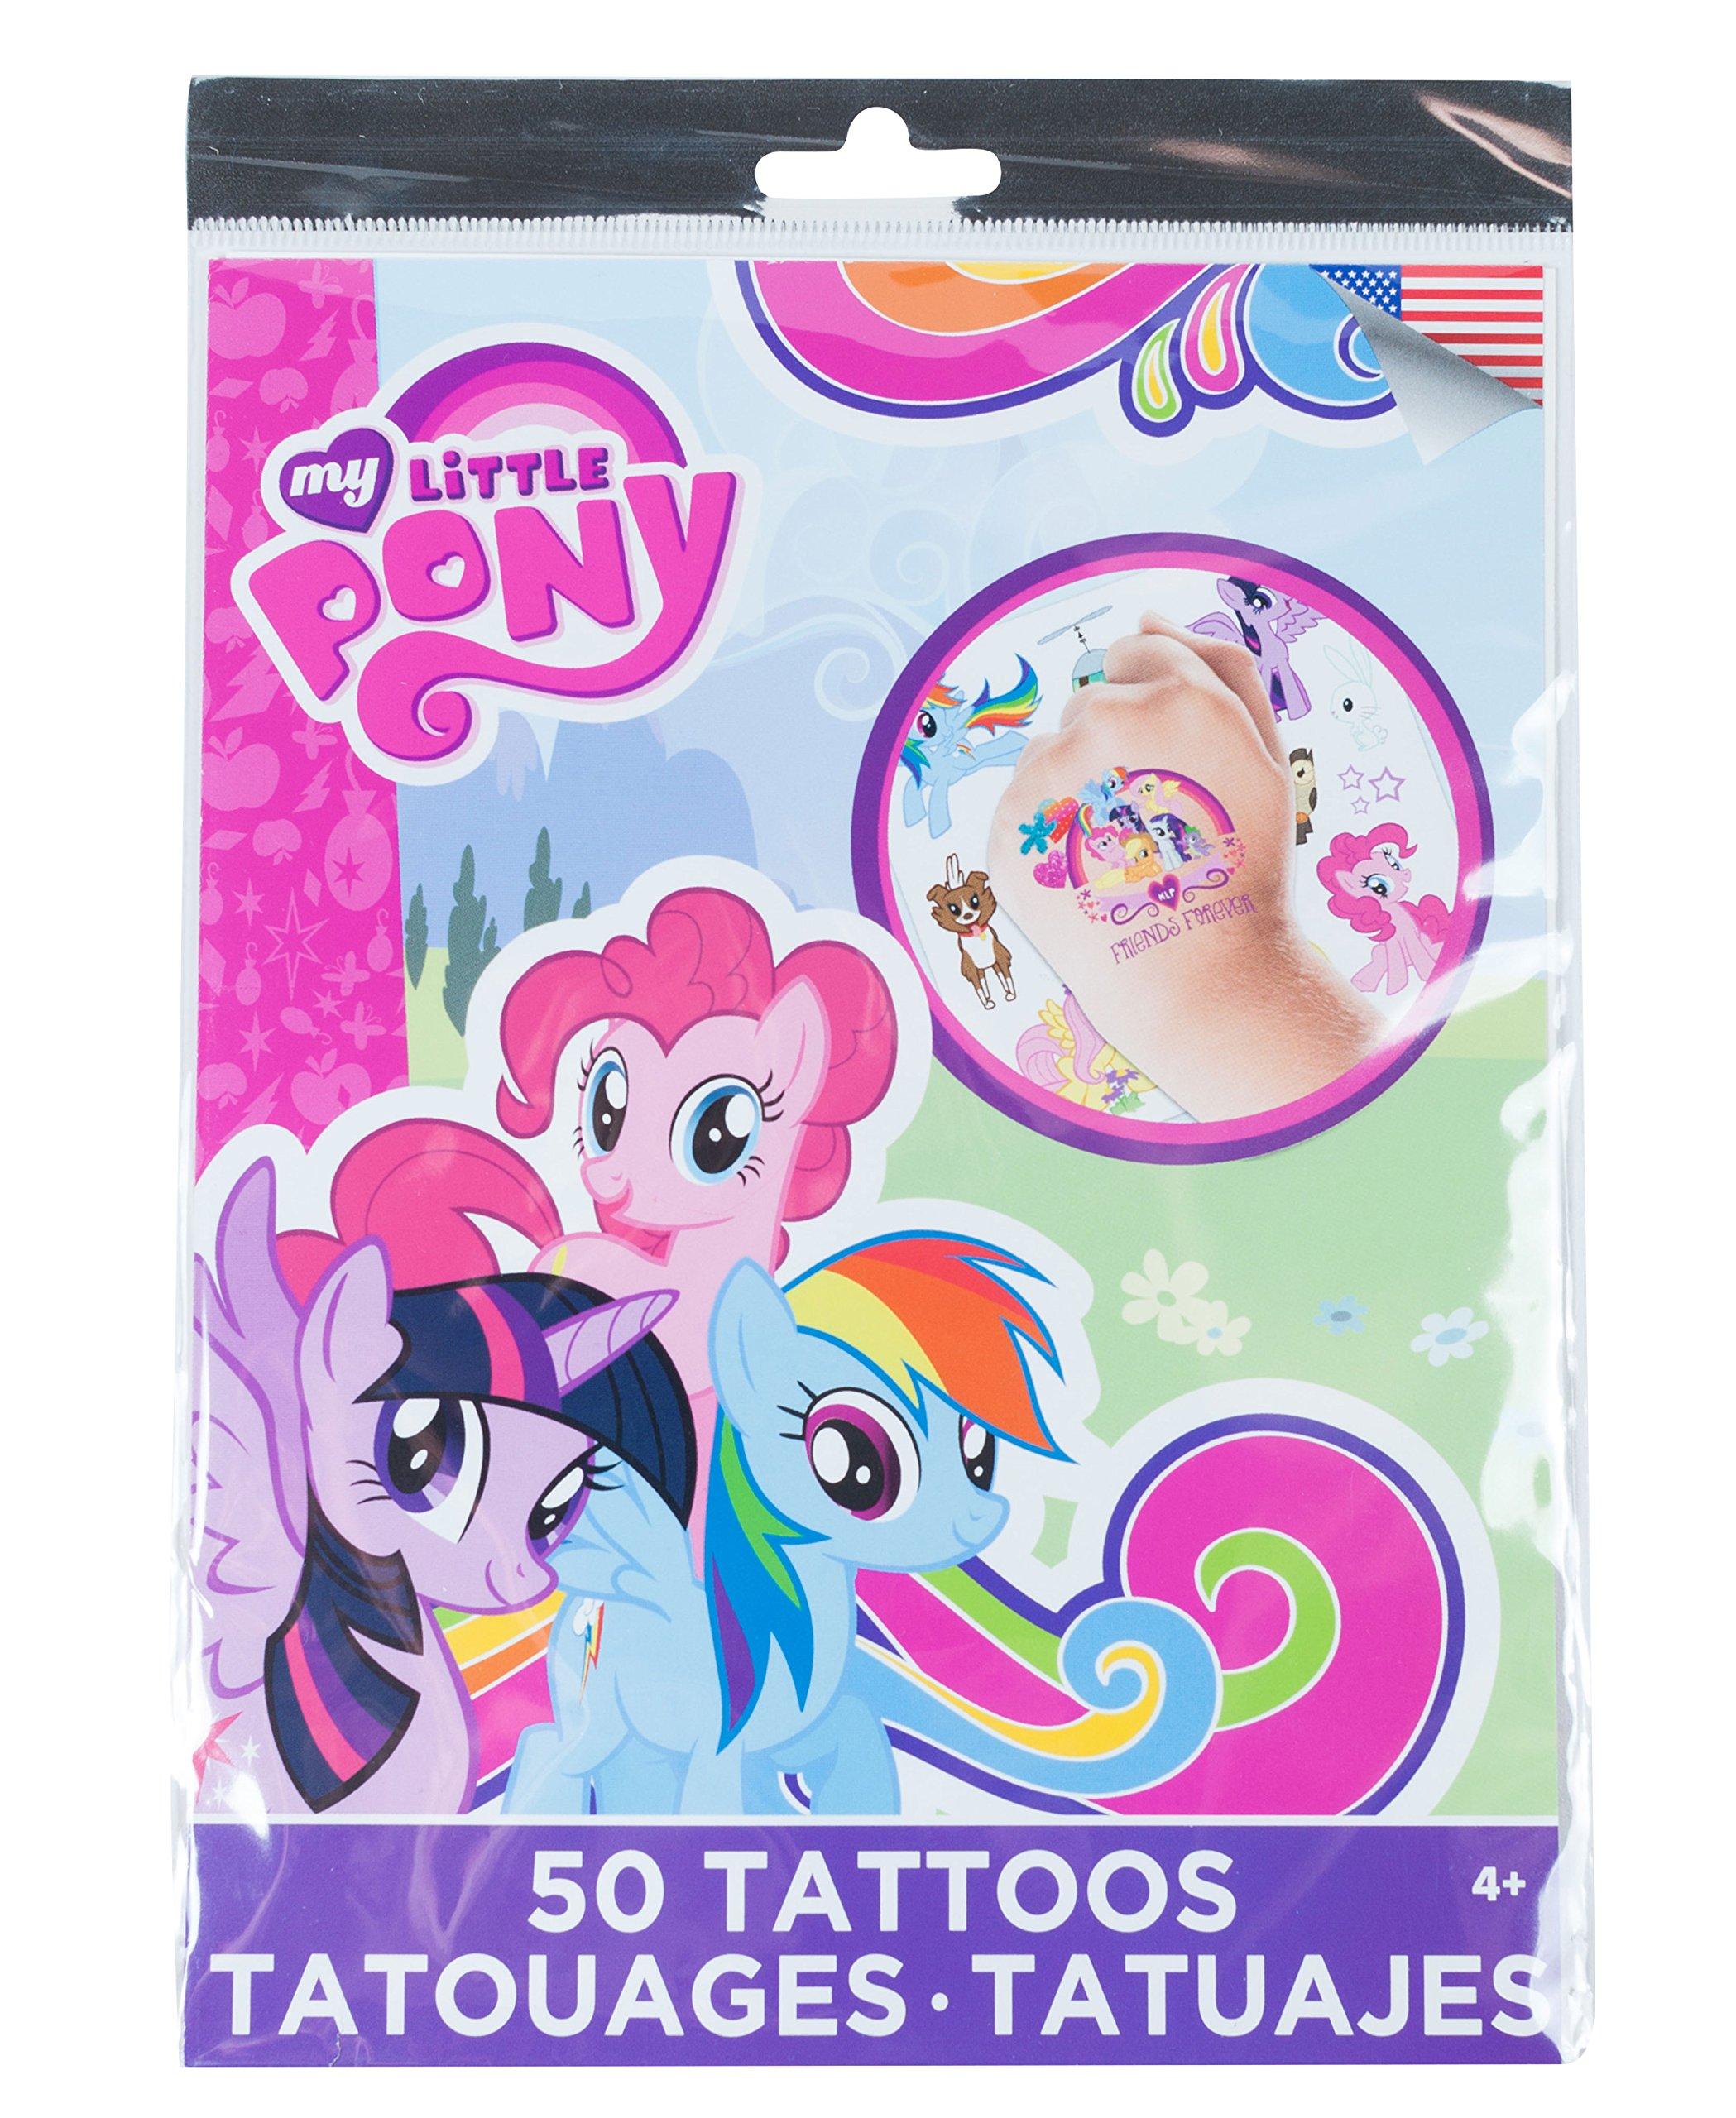 Savvi Disney Temporary Tattoos, Set of 50, Mylittlepony, 3-pack by Savvi (Image #1)